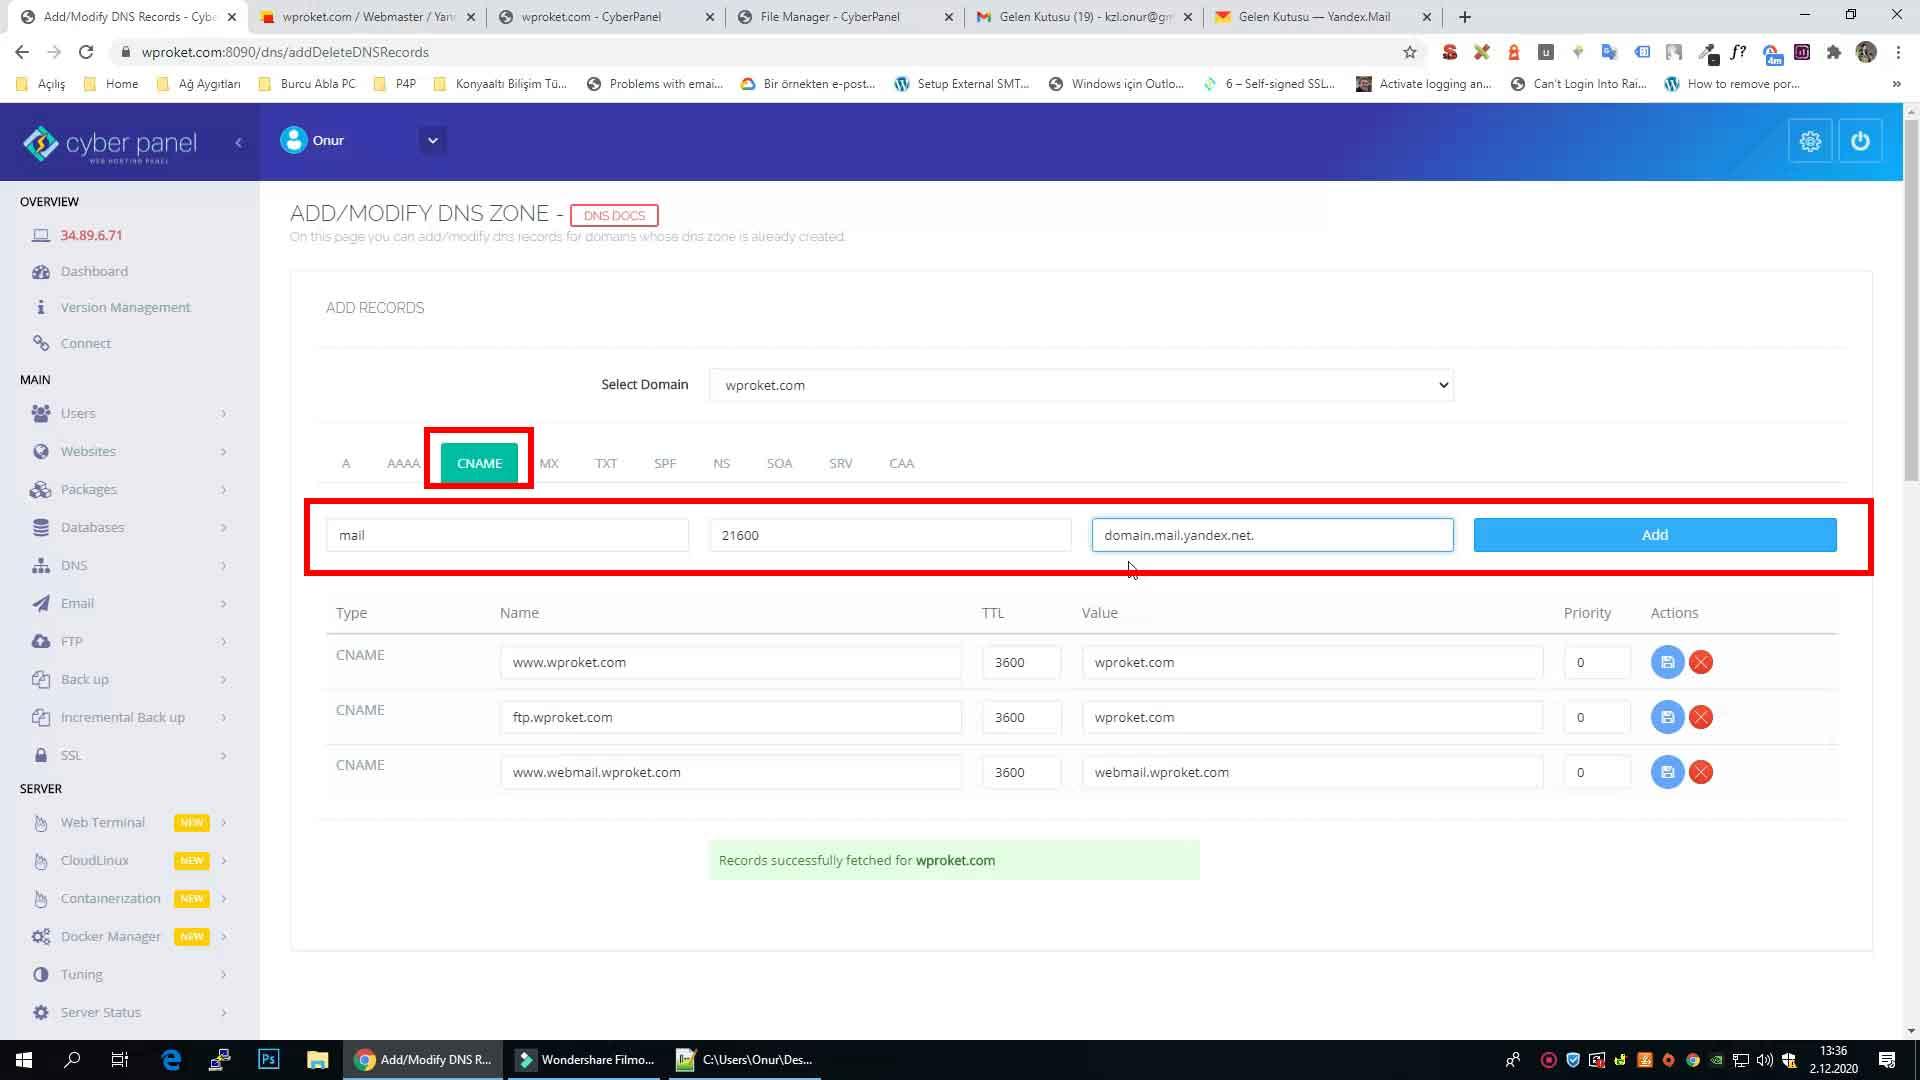 Yandex mail CNAME kaydı ekleme